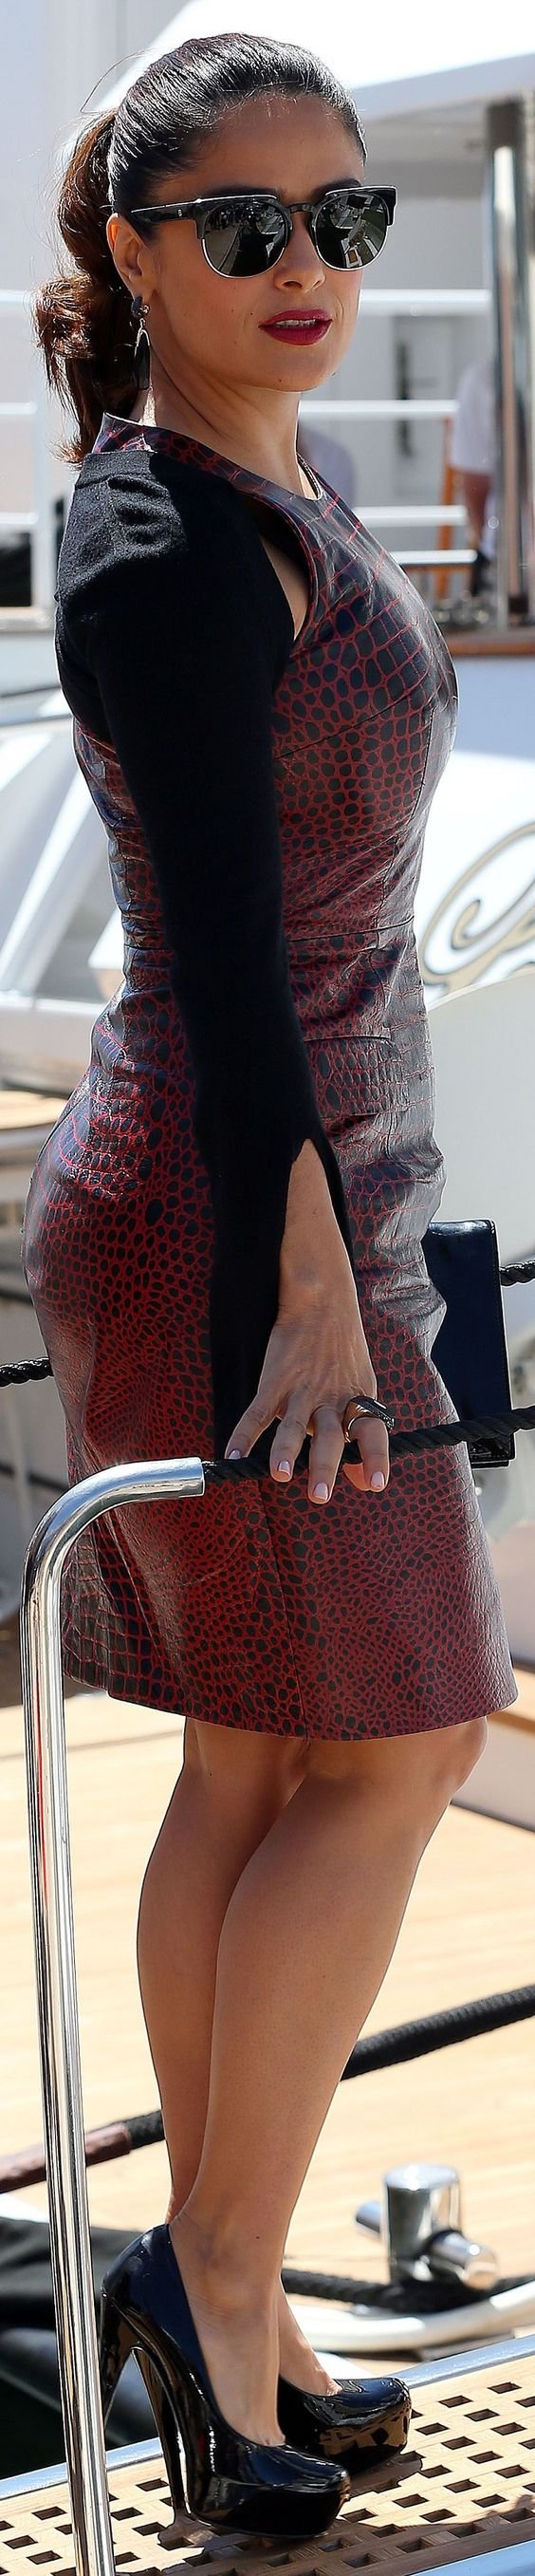 Salma Hayek boarding a boat Cannes15 May 2015